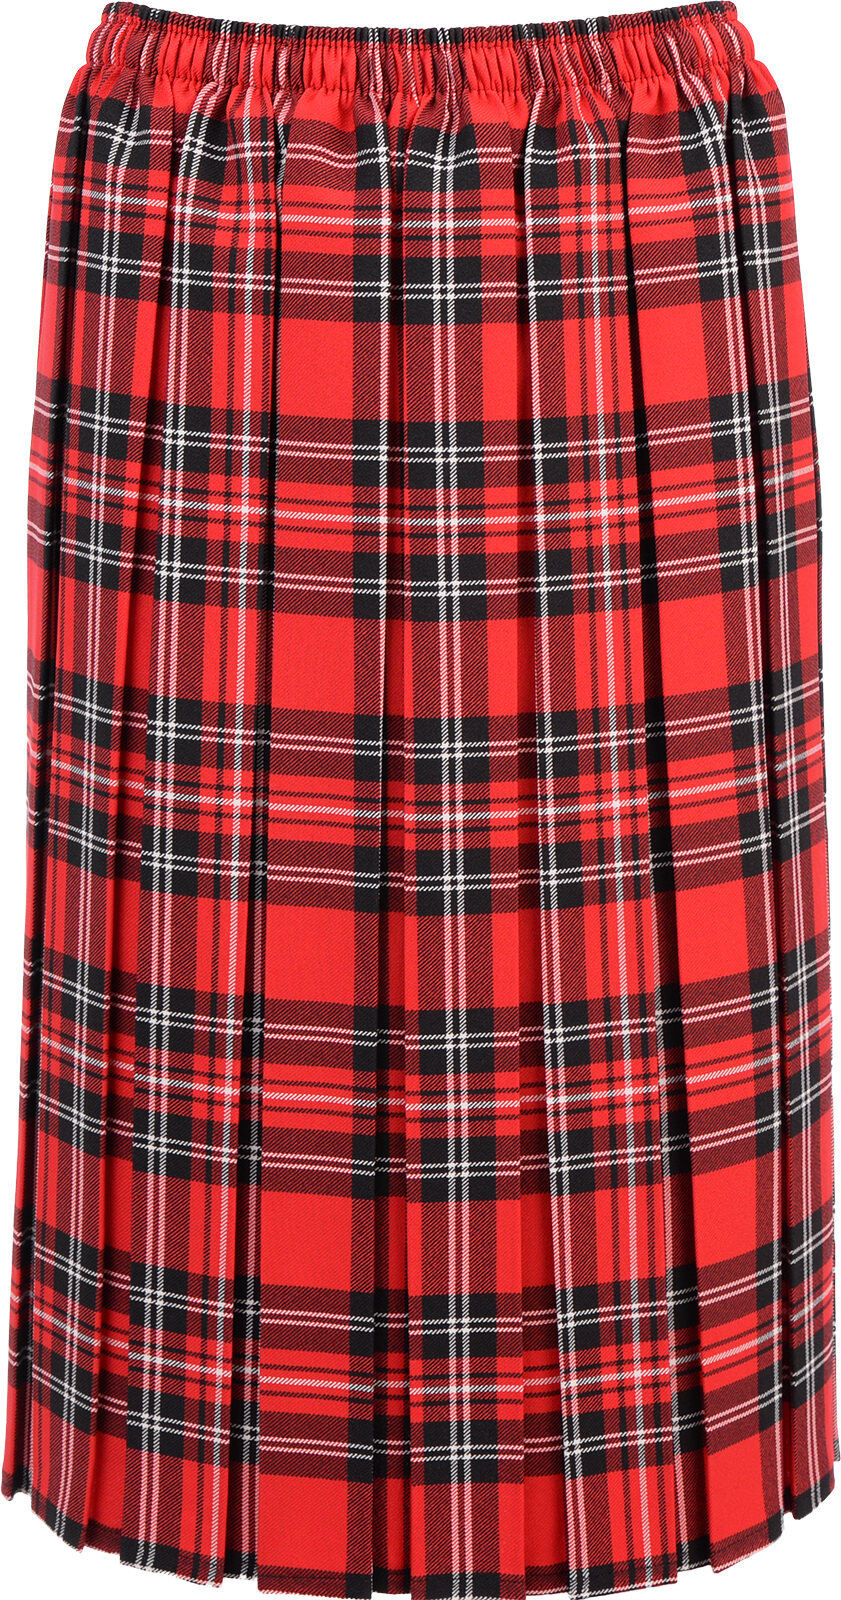 Womens Tartan Box Pleated Skirt Elasticated Waist 27 inch Length KK20